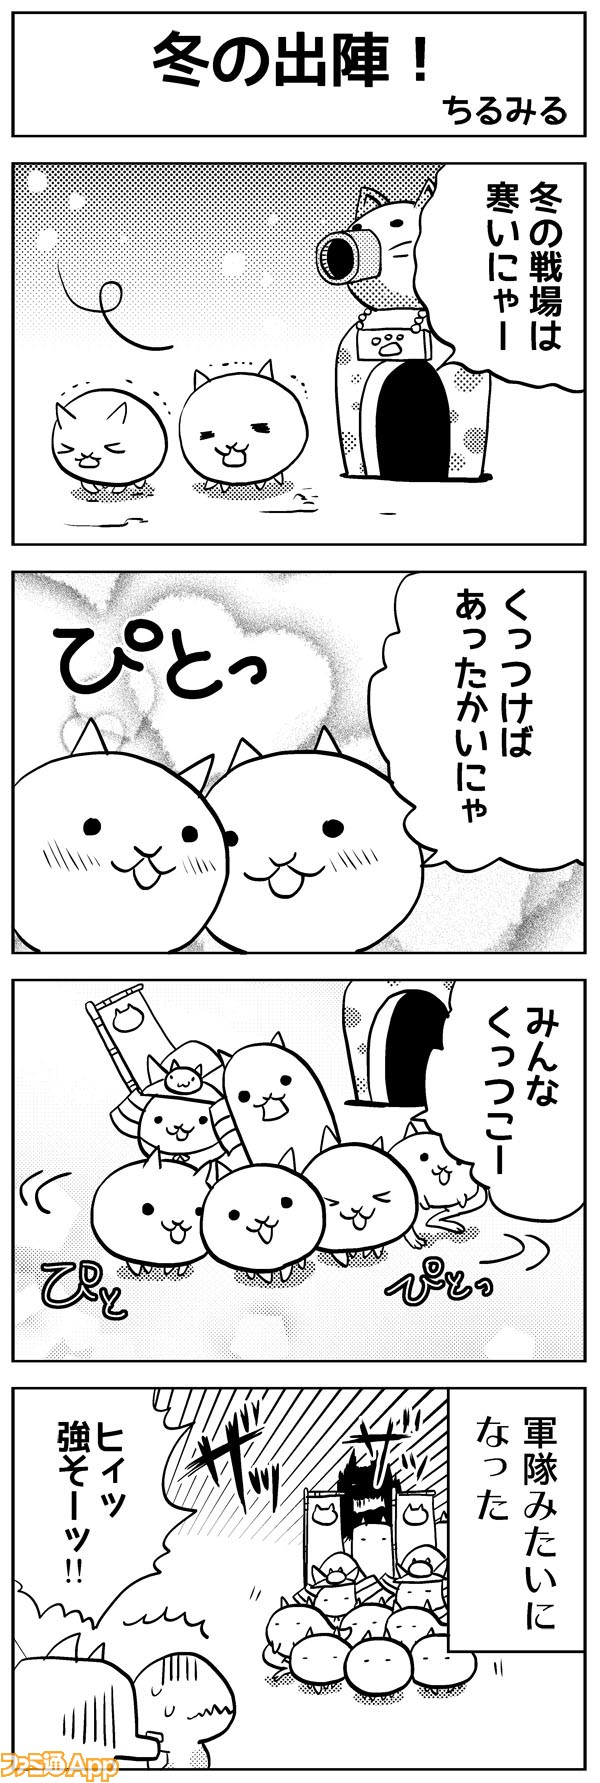 12chiru_005